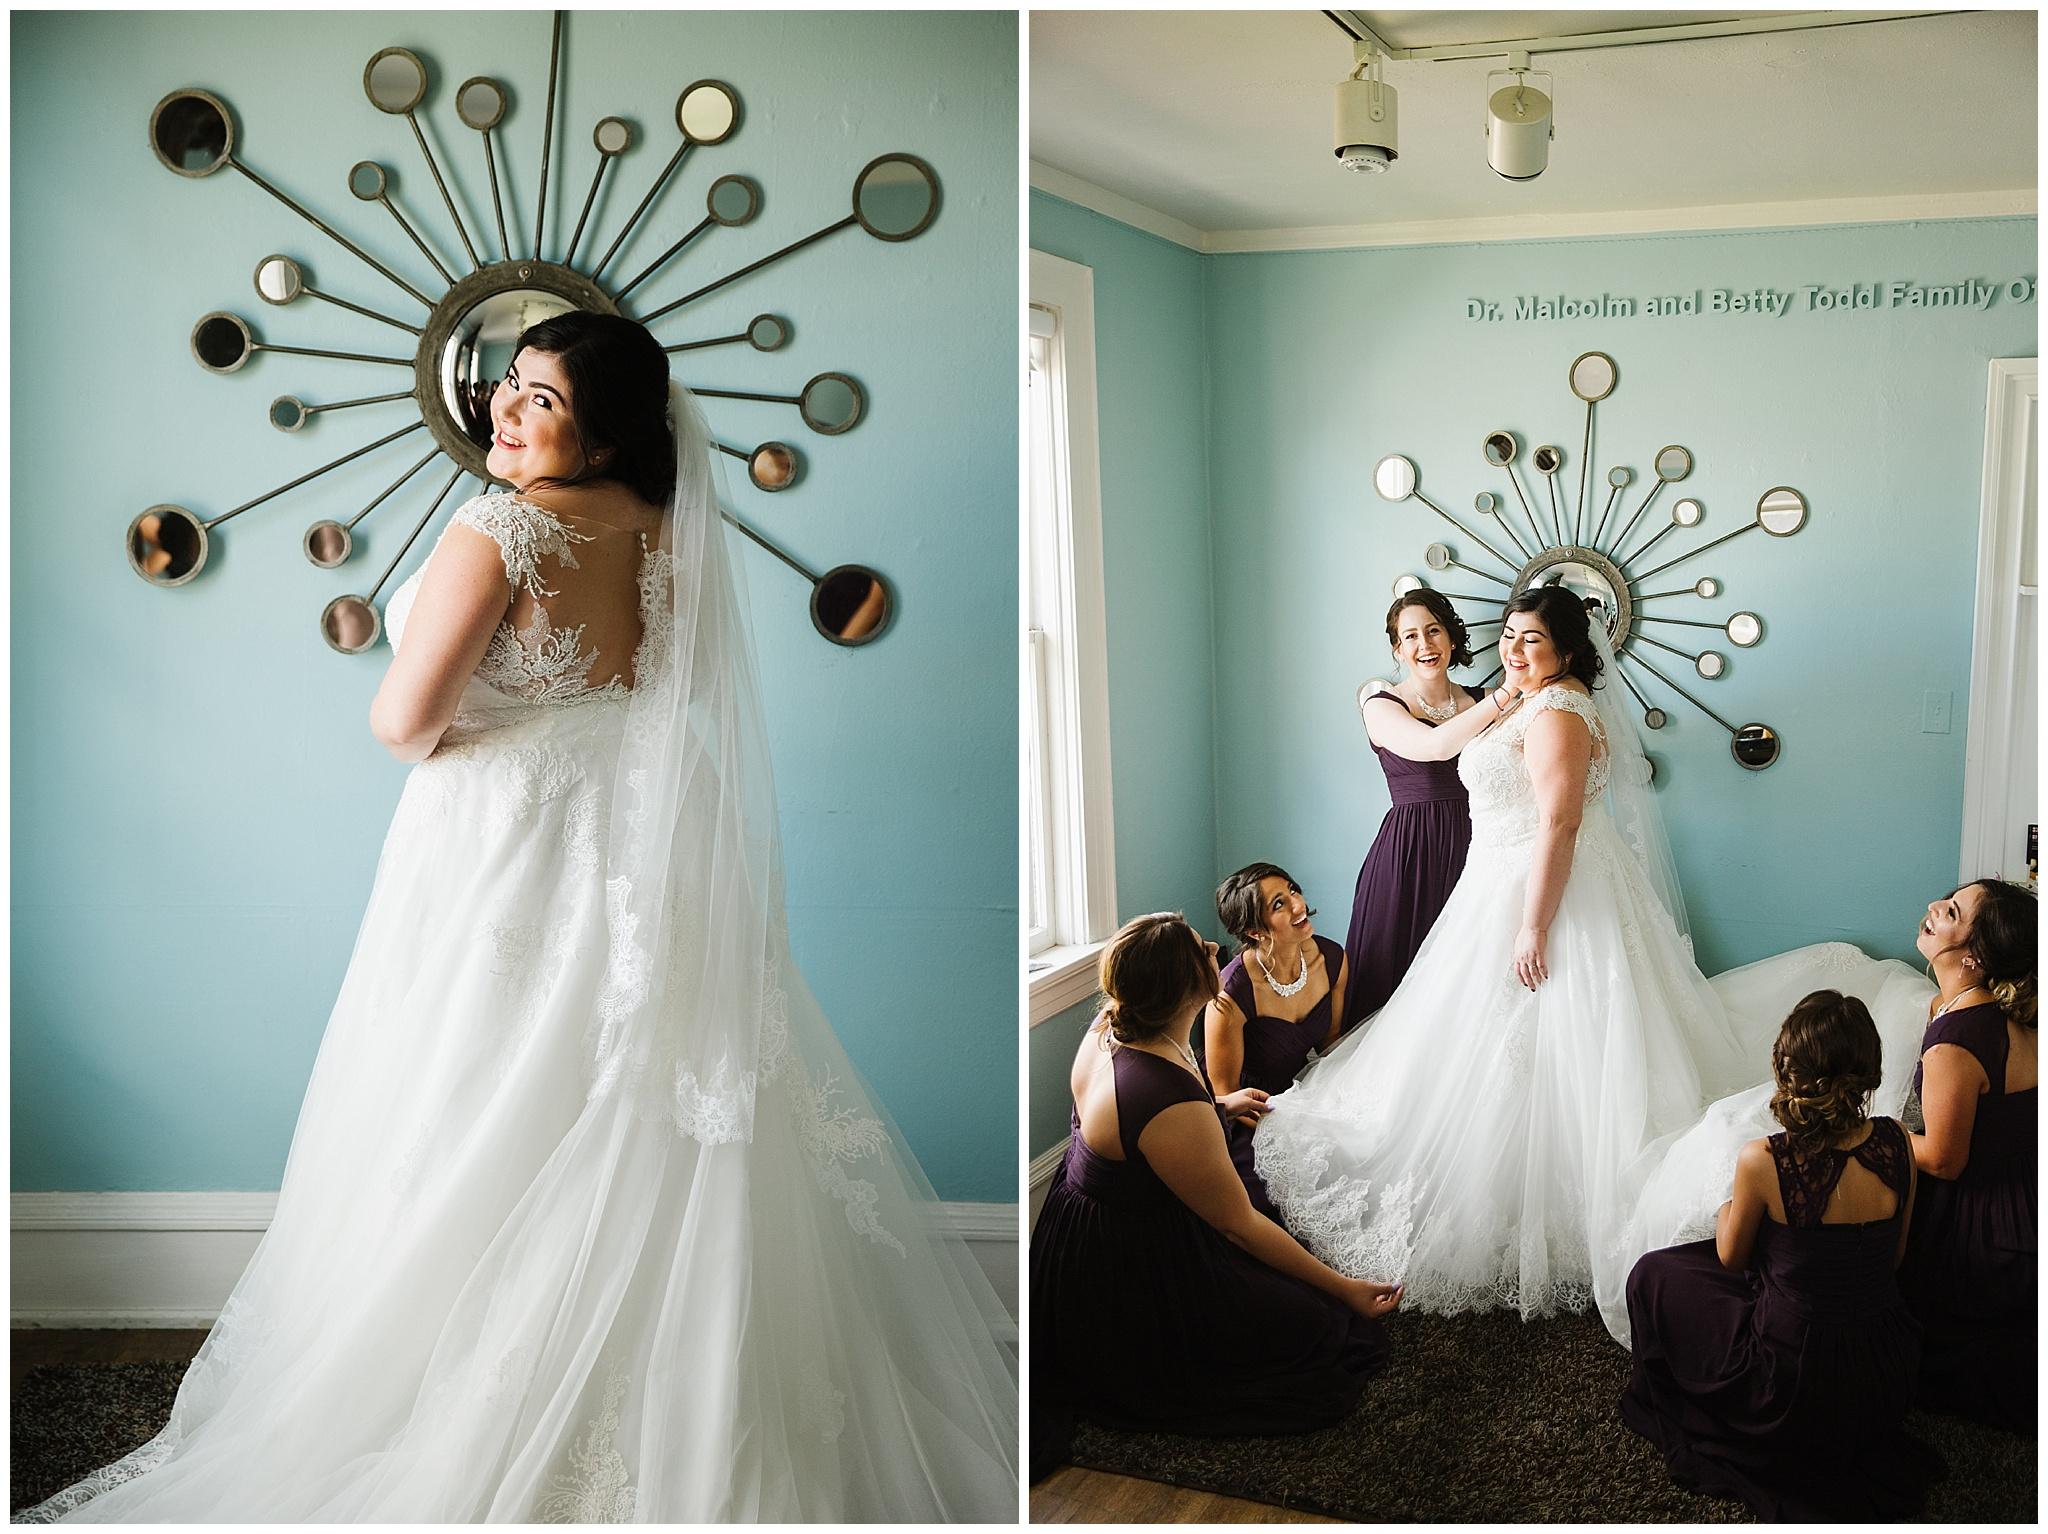 Carol_and_Grant_Wedding_3-3-18-7138.jpg